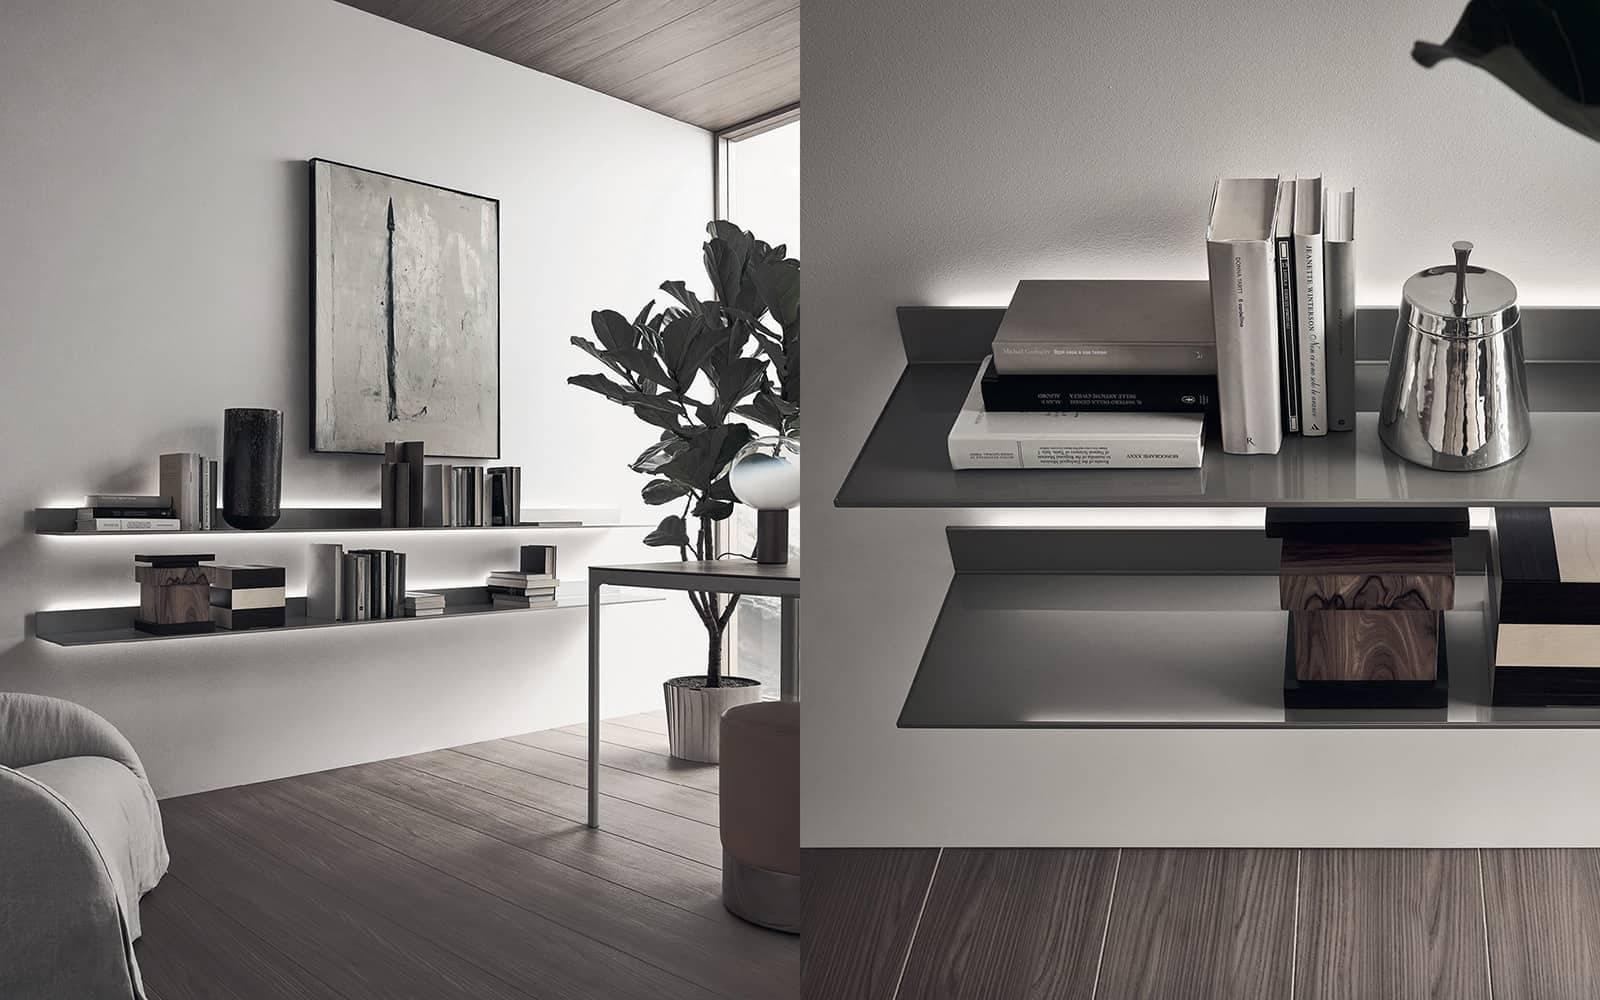 rimadesio-eos-design-glazen-leplanken-wandplanken-noctum